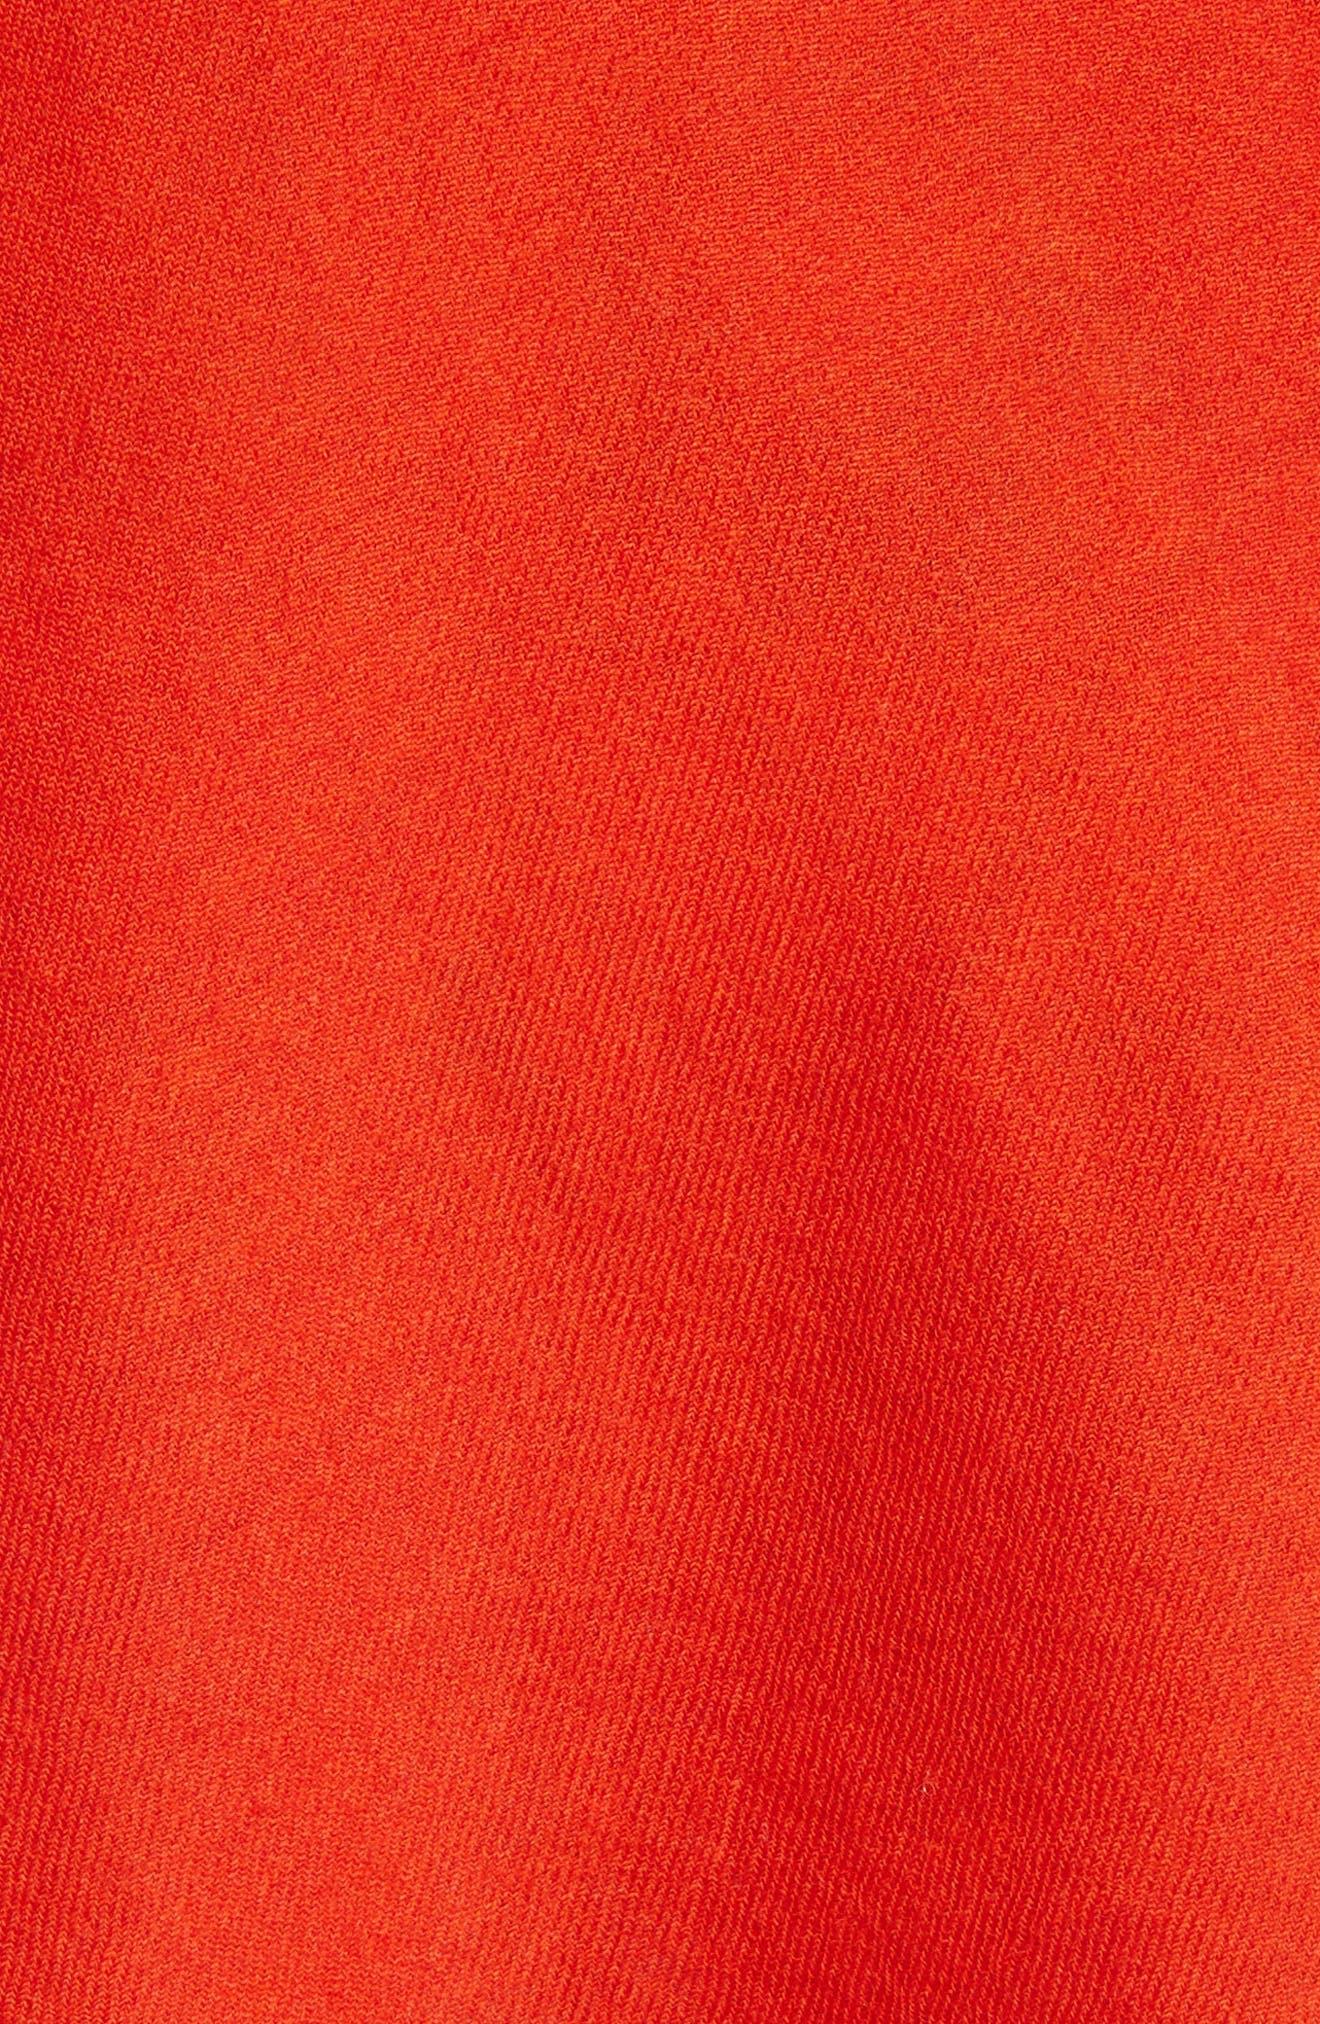 Draped Split One-Shoulder Top,                             Alternate thumbnail 5, color,                             600